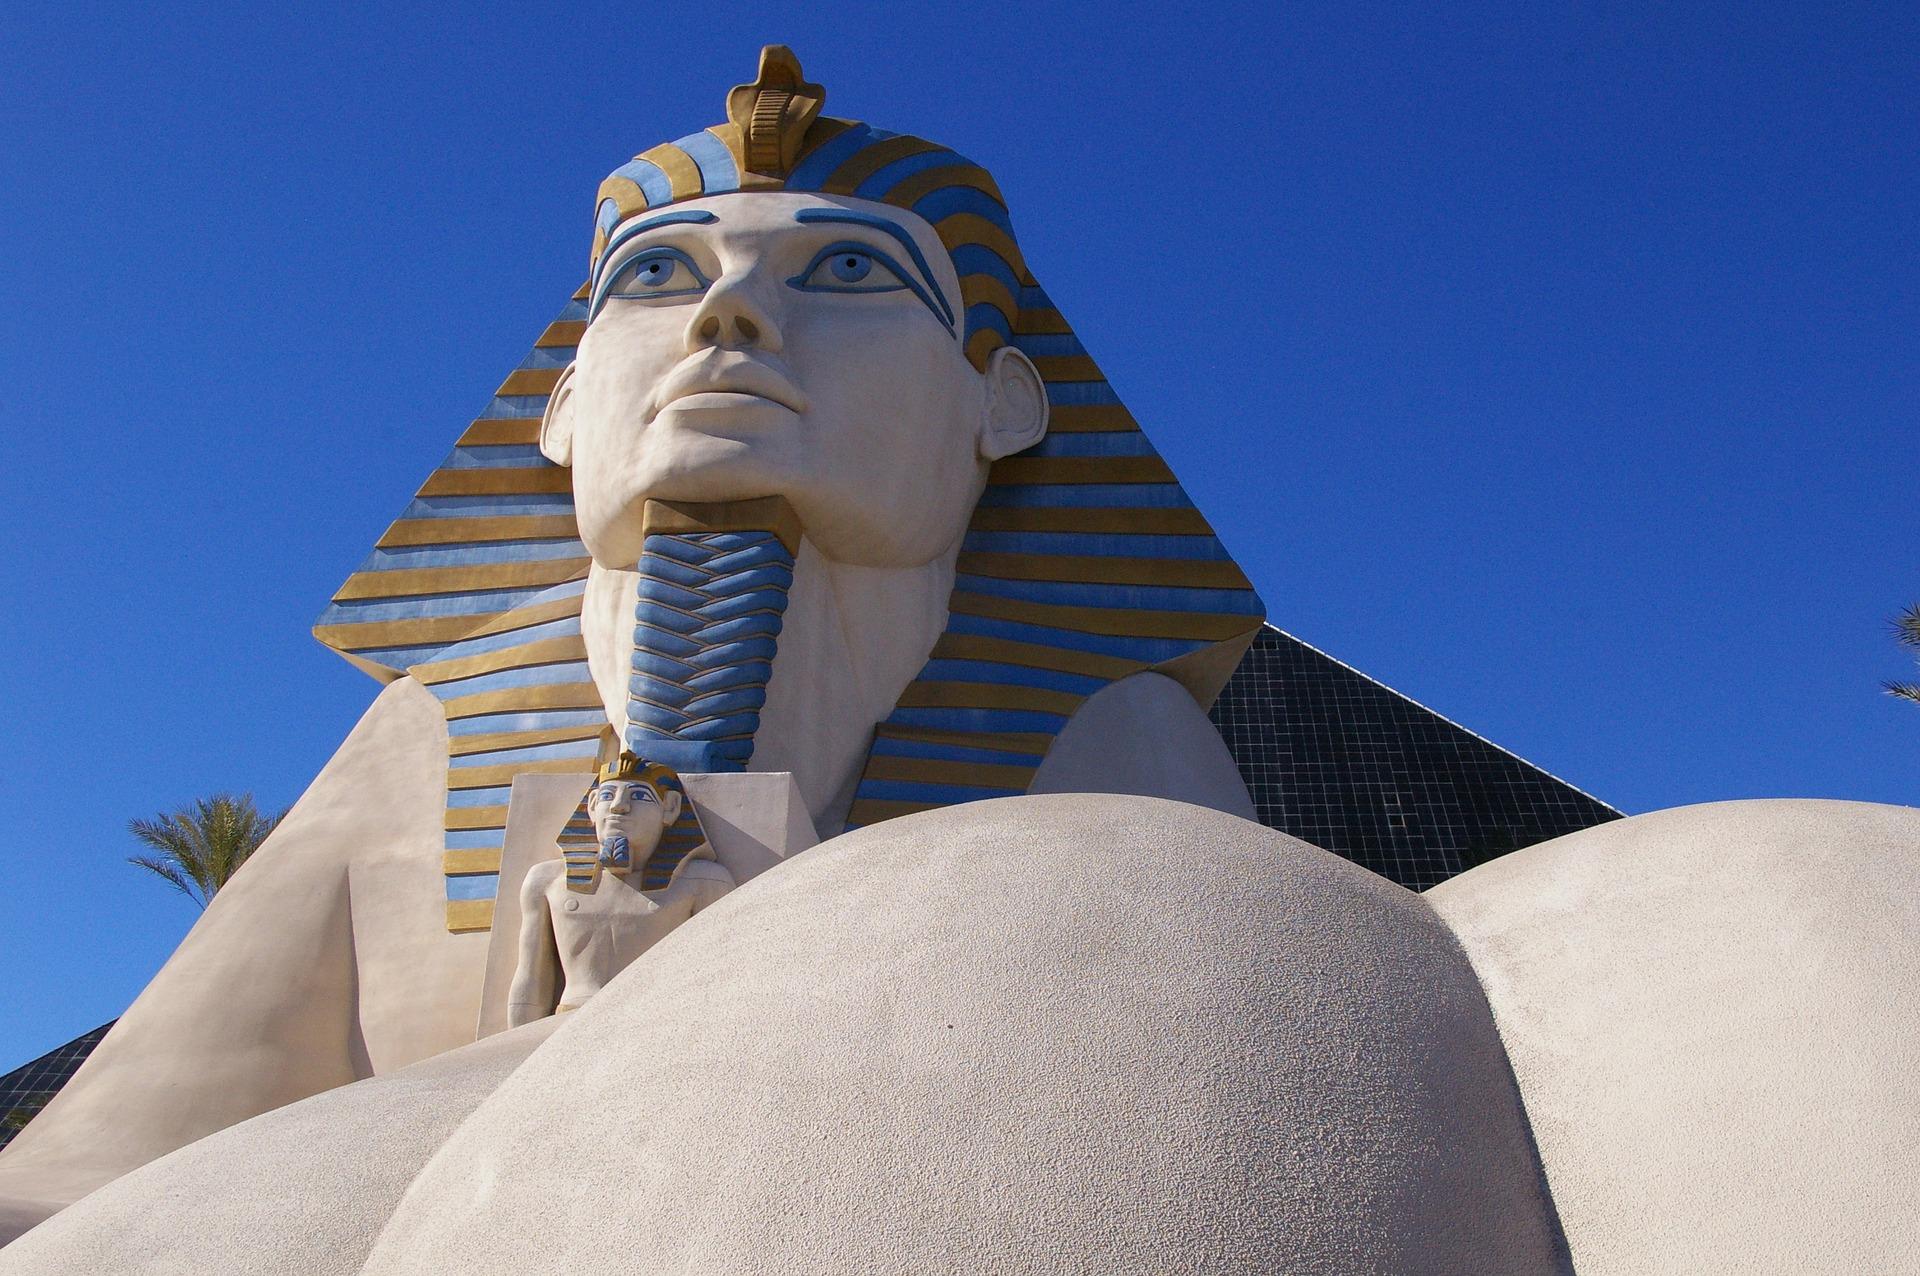 Sphinx statue at the Luxor Hotel and Casino in Las Vegas Nevada